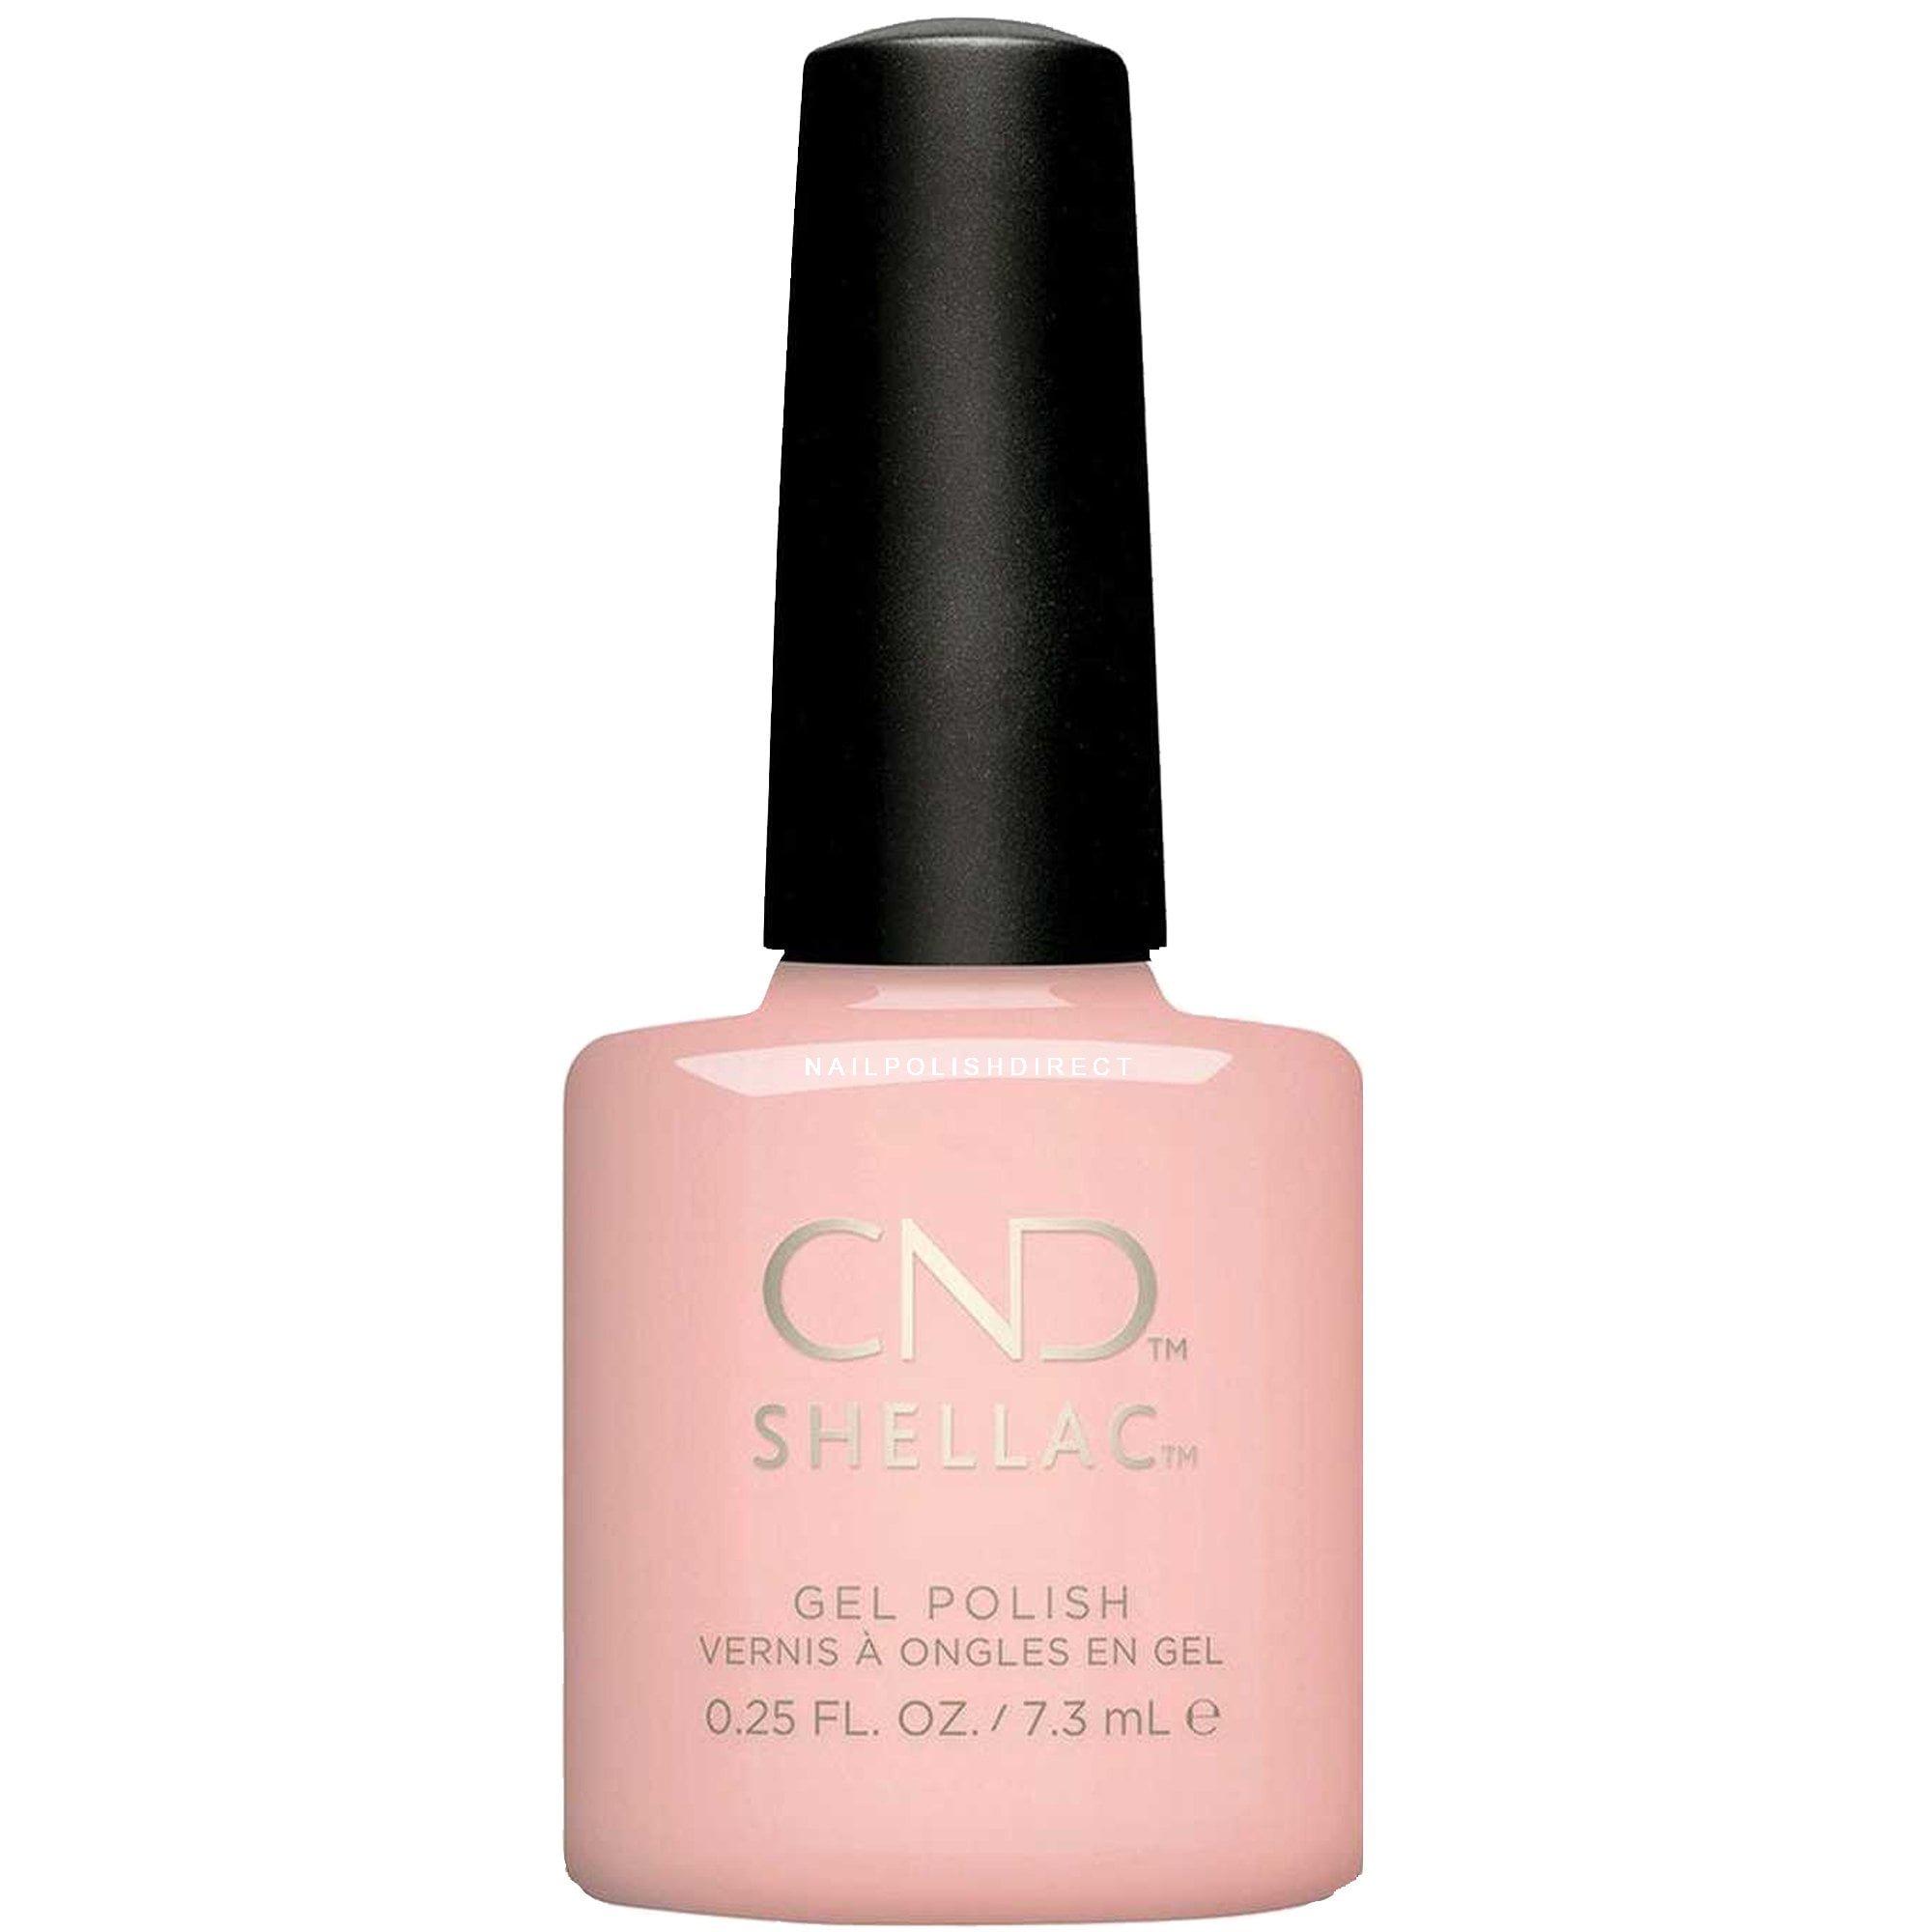 CND - Shellac UV Gel Color - Hot Chilis - 7.3ml